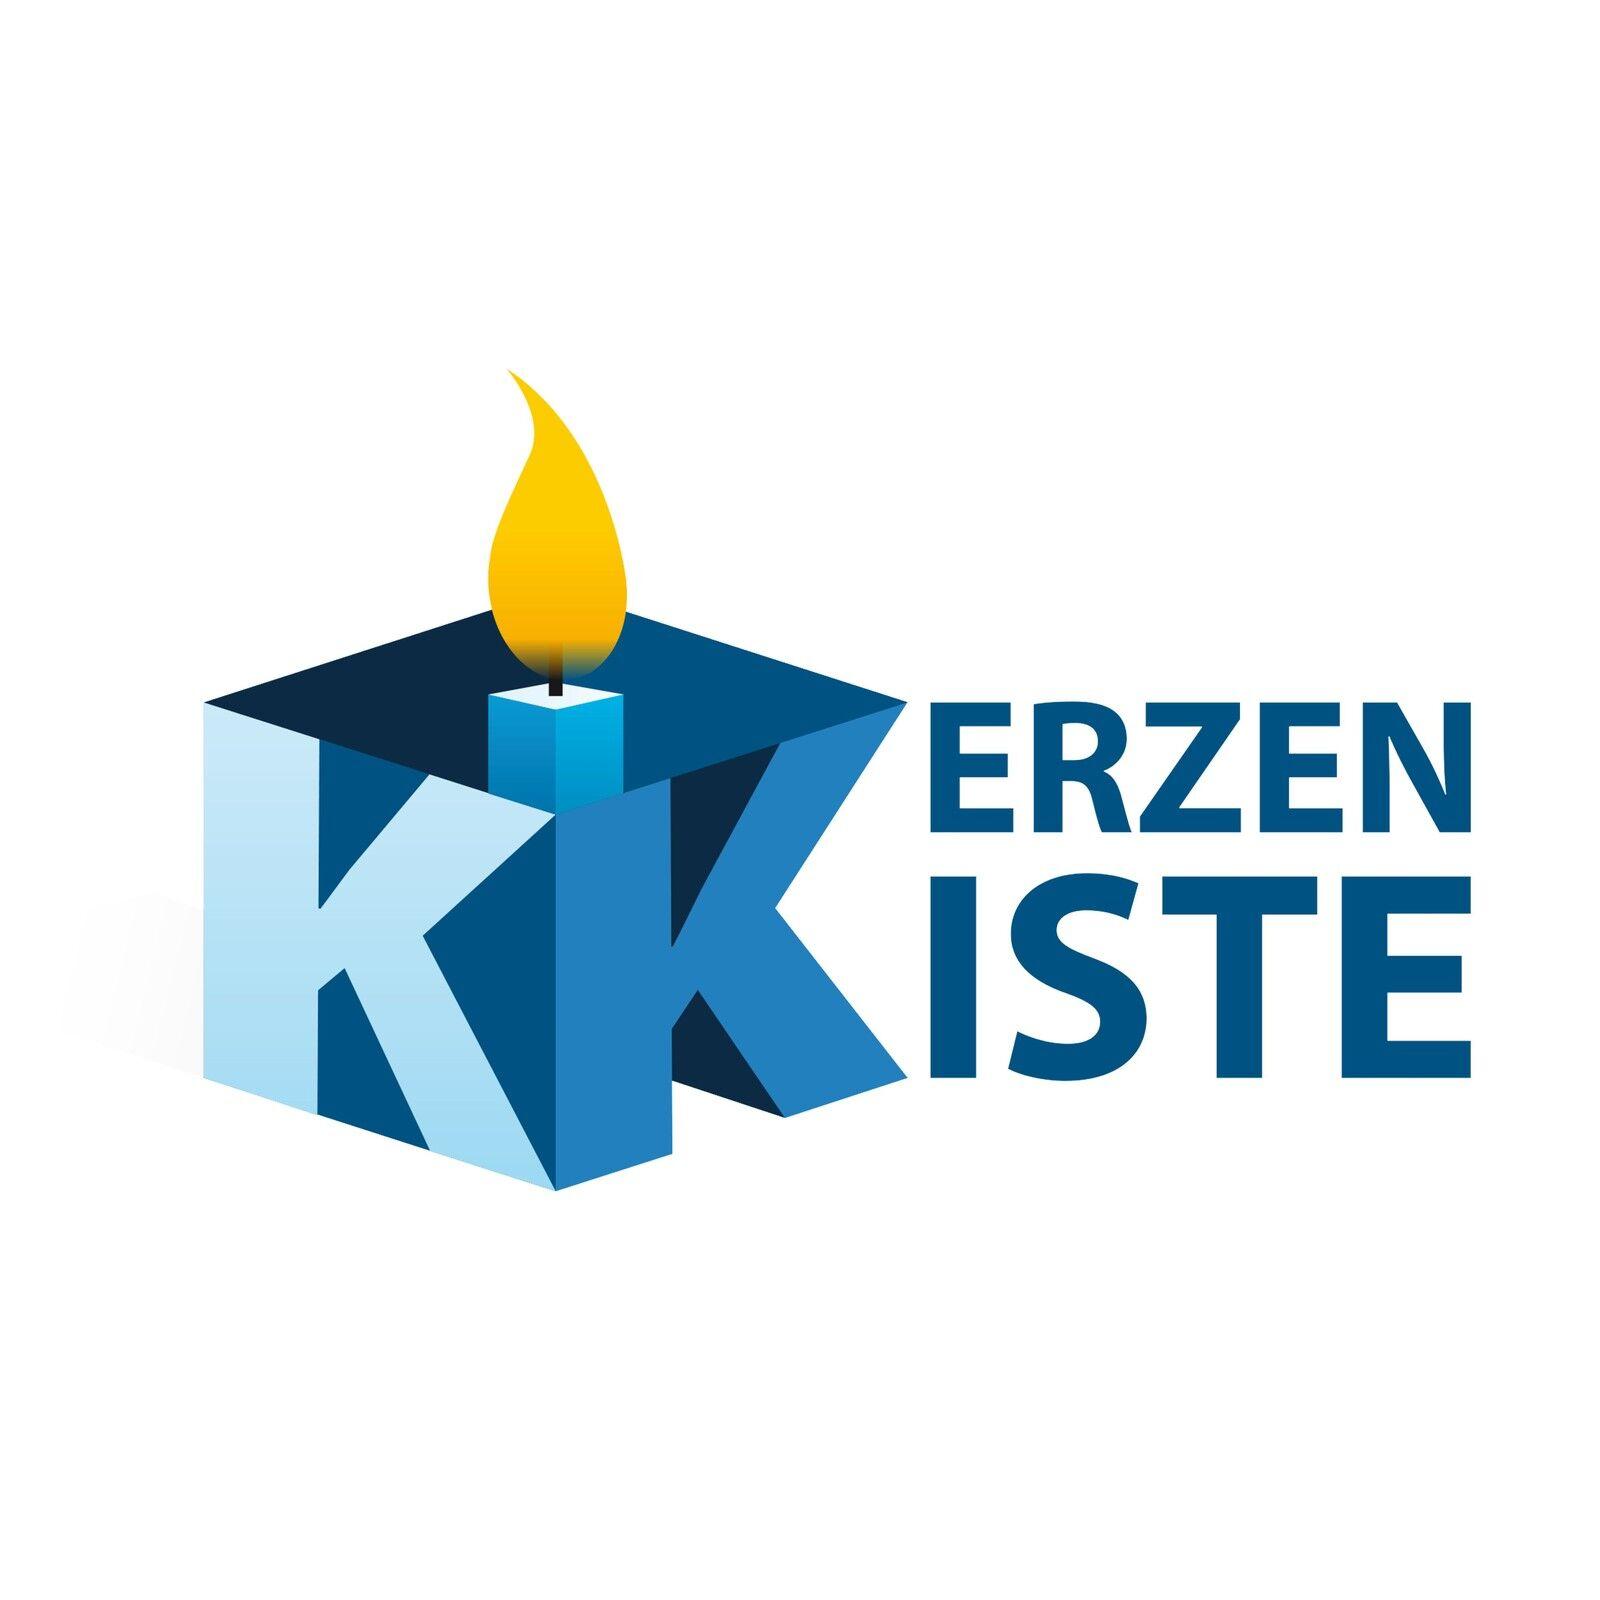 Kerzenkiste_Onlineshop